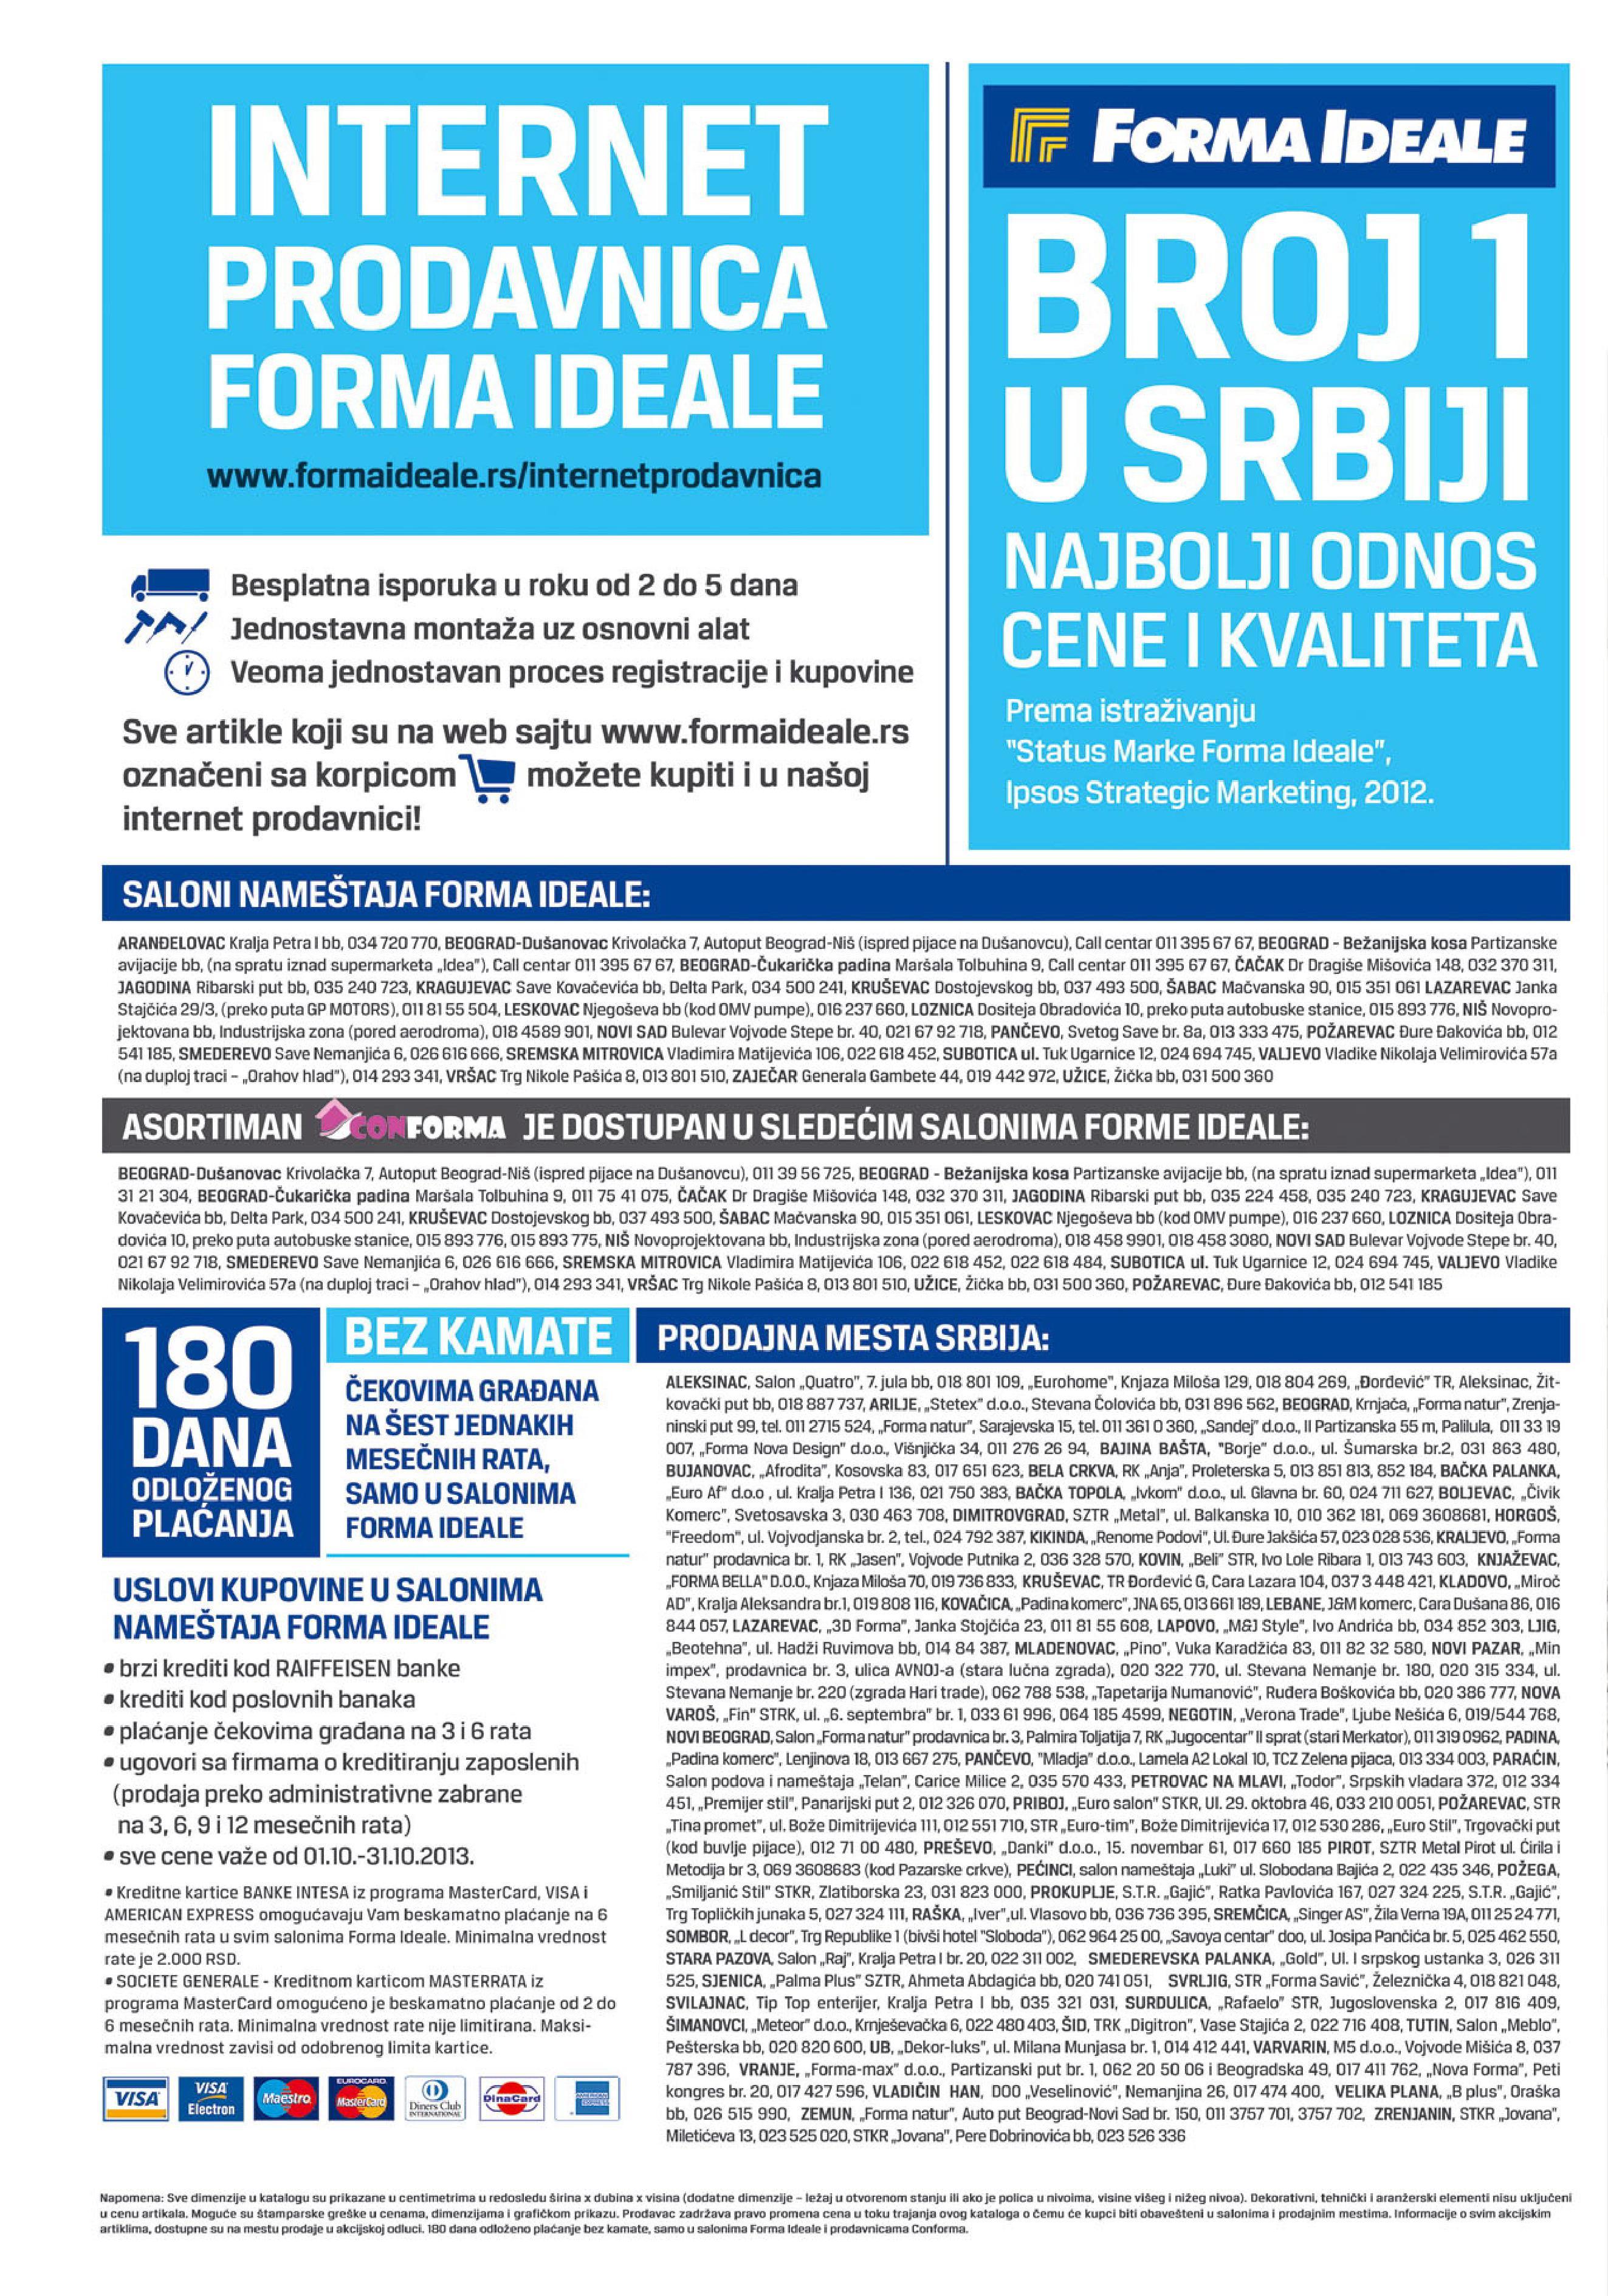 Forma Ideale katalog super ponude